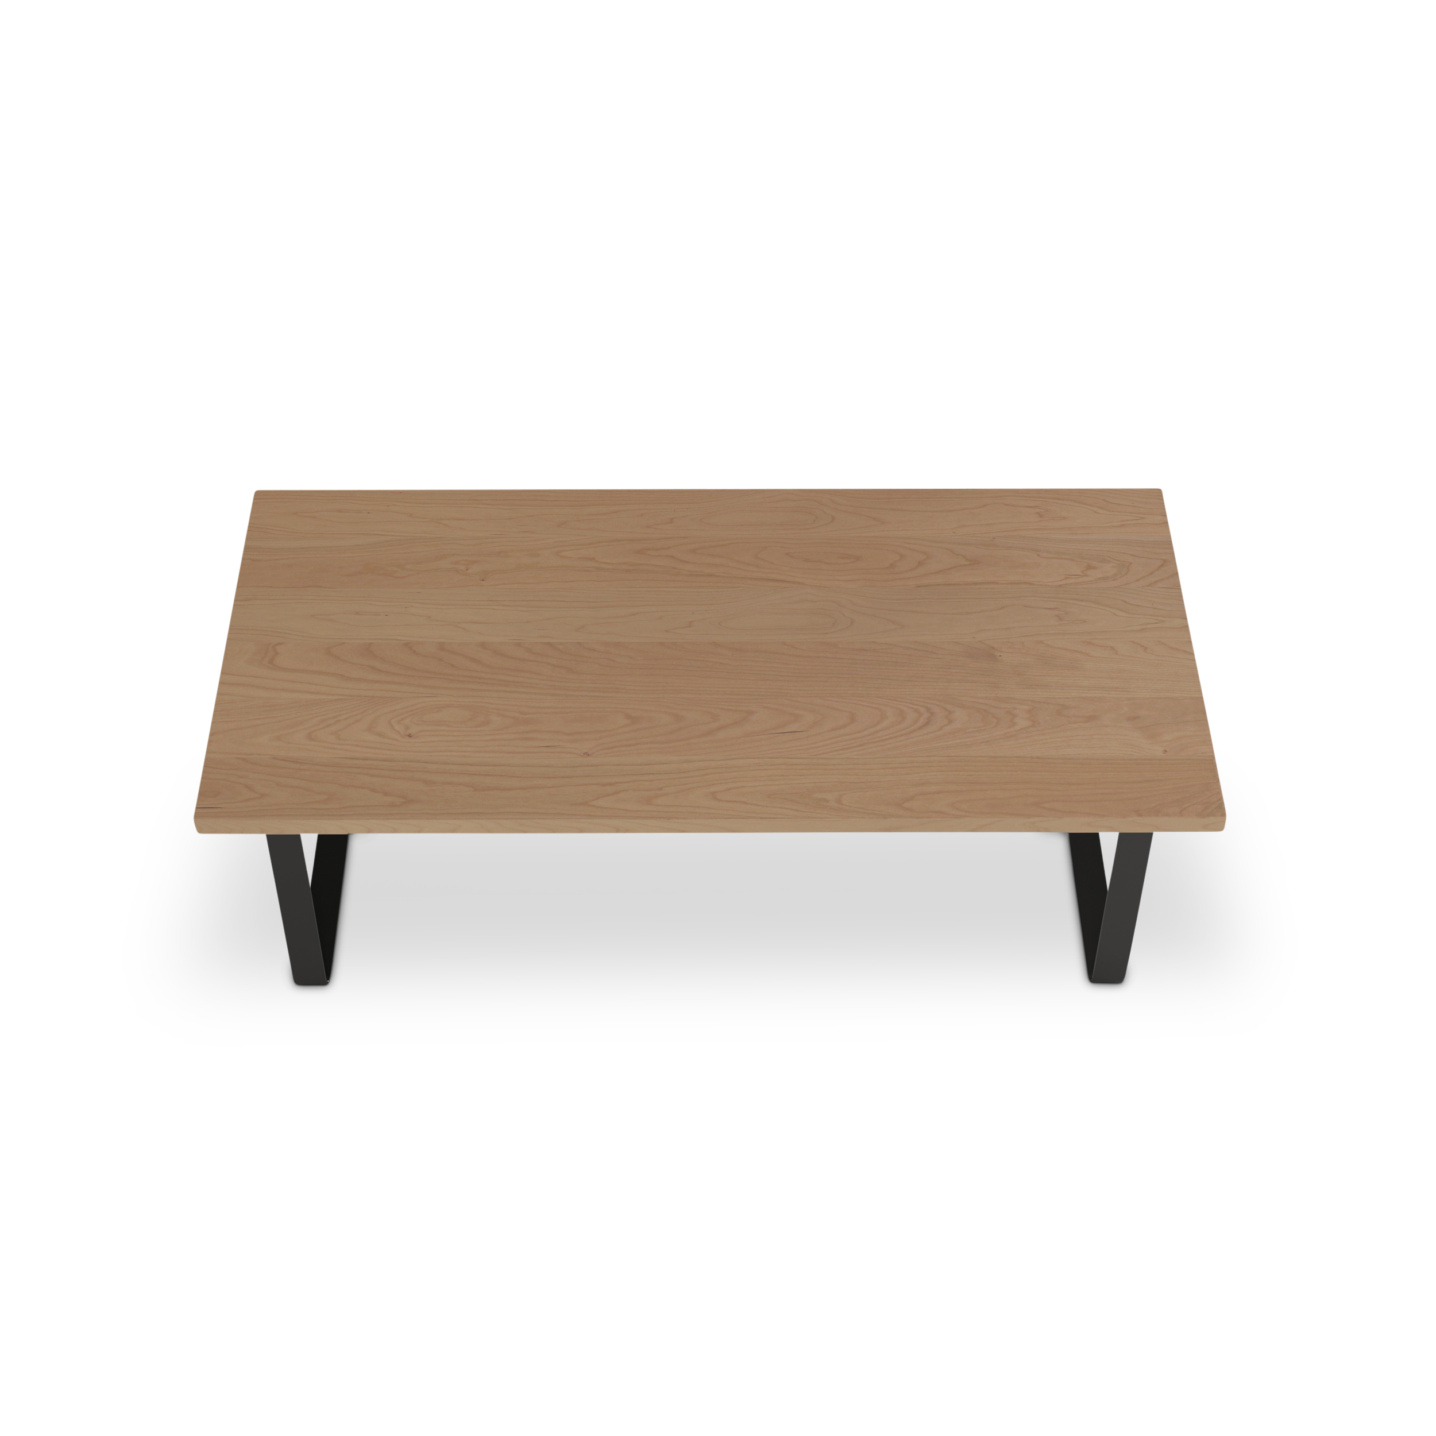 Custom cherry table with metal legs